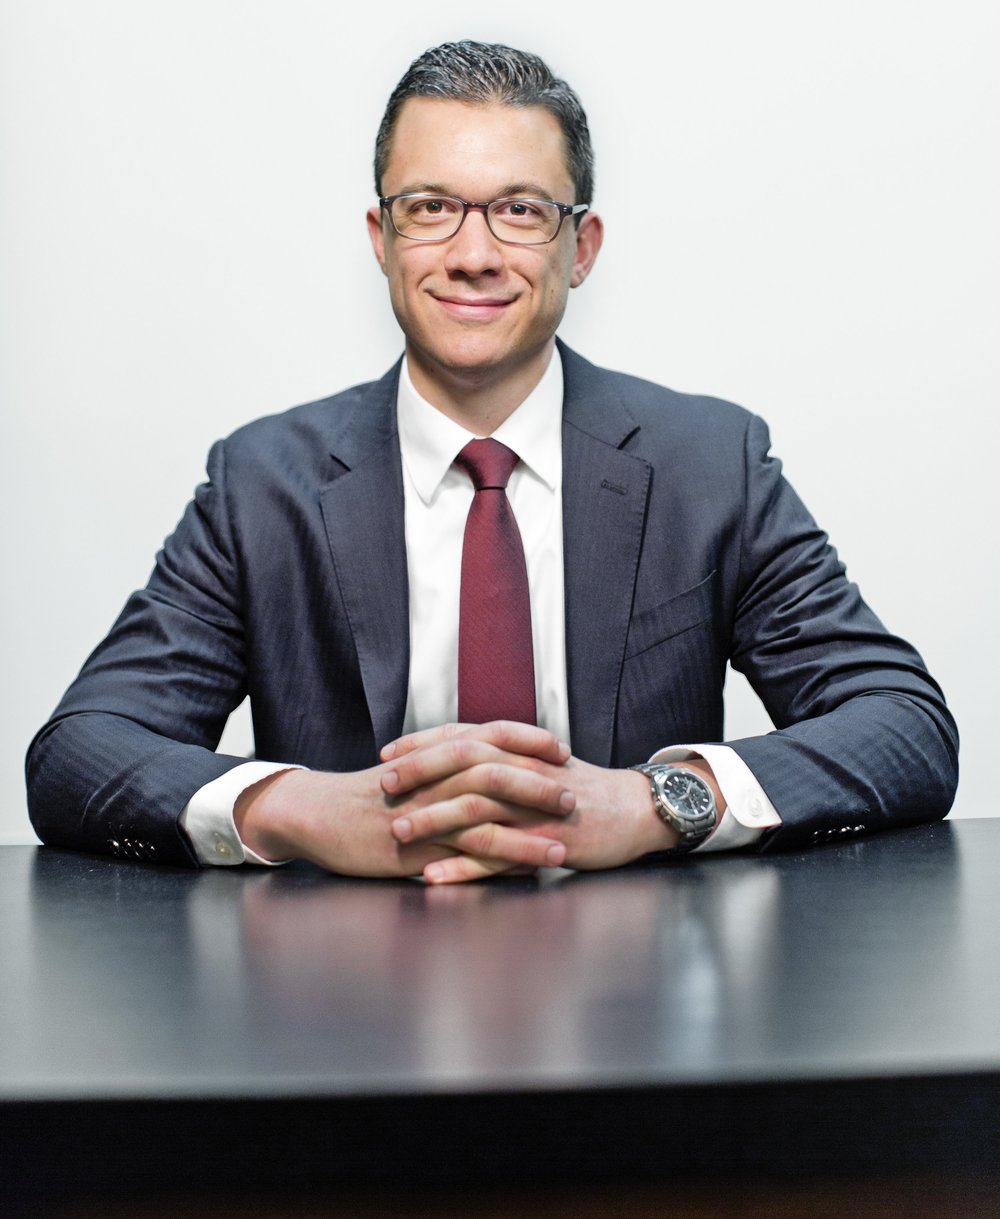 Zak T. Goldstein, Esq - Philadelphia Resisting Arrest Lawyer